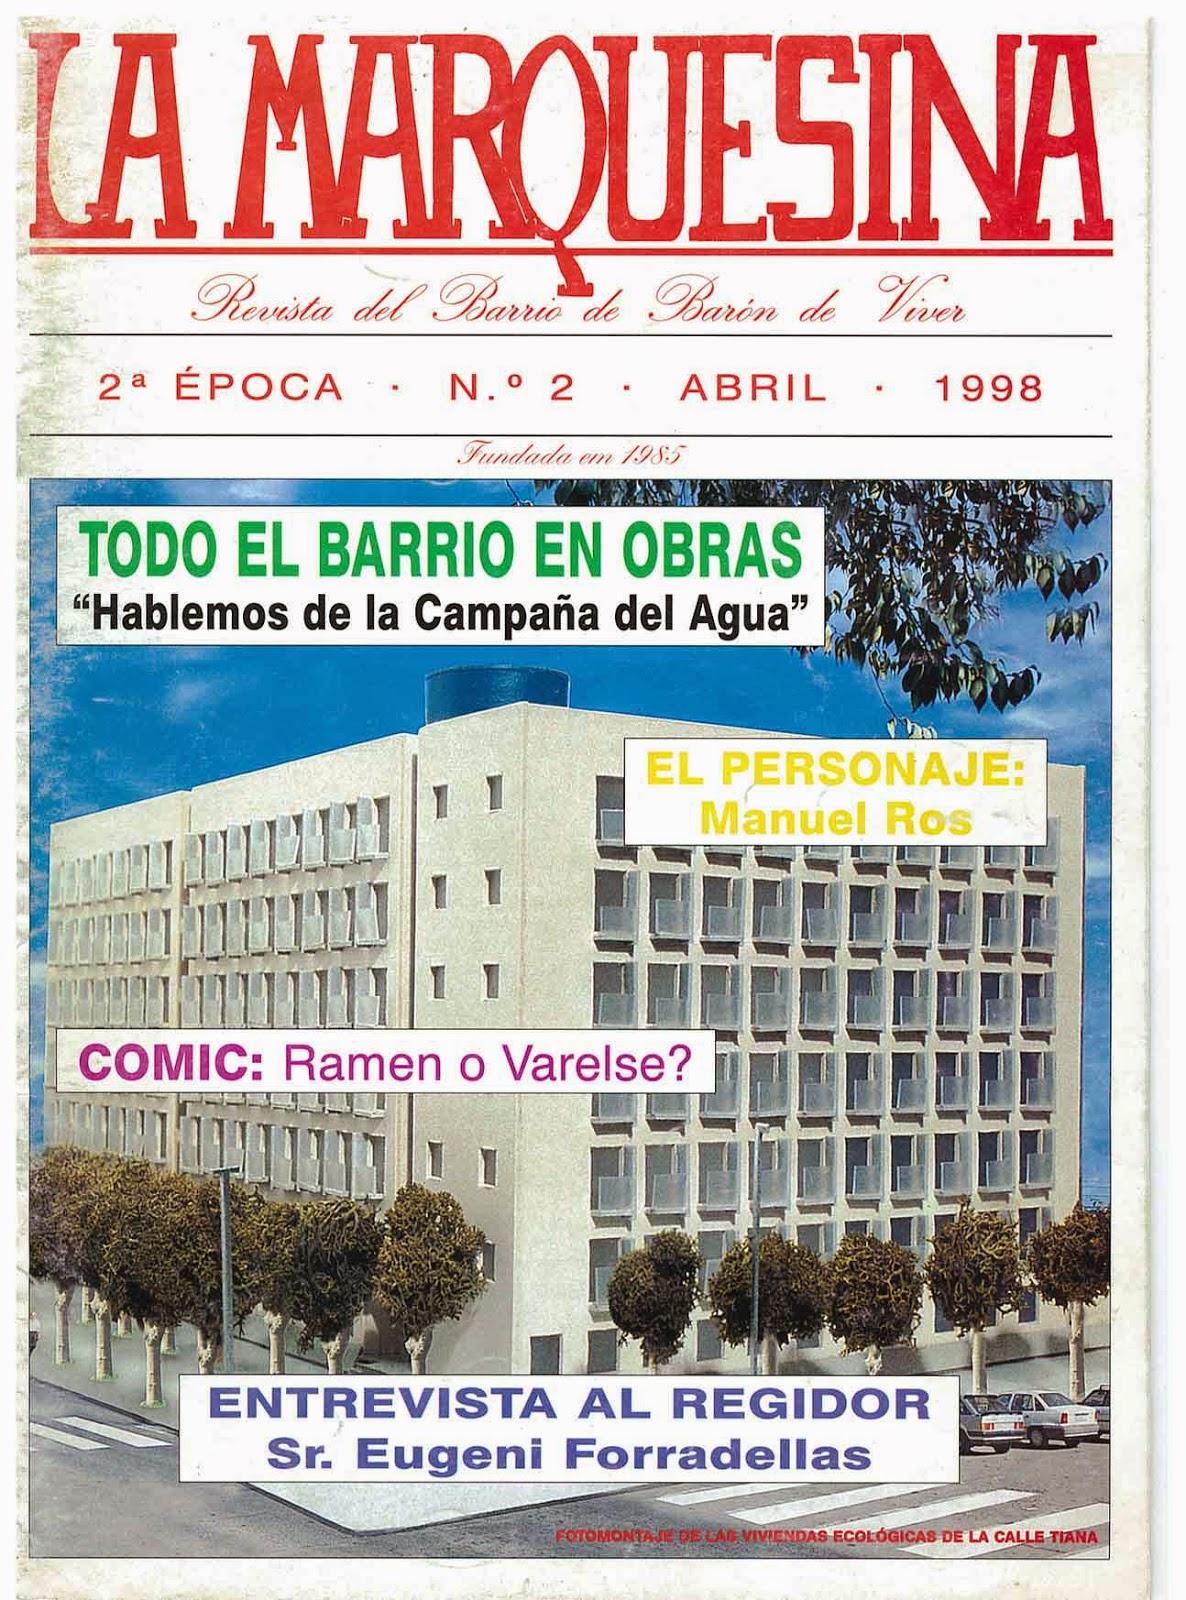 2° EPOCA - N° 2 - ABRIL 1998 - PORTADA